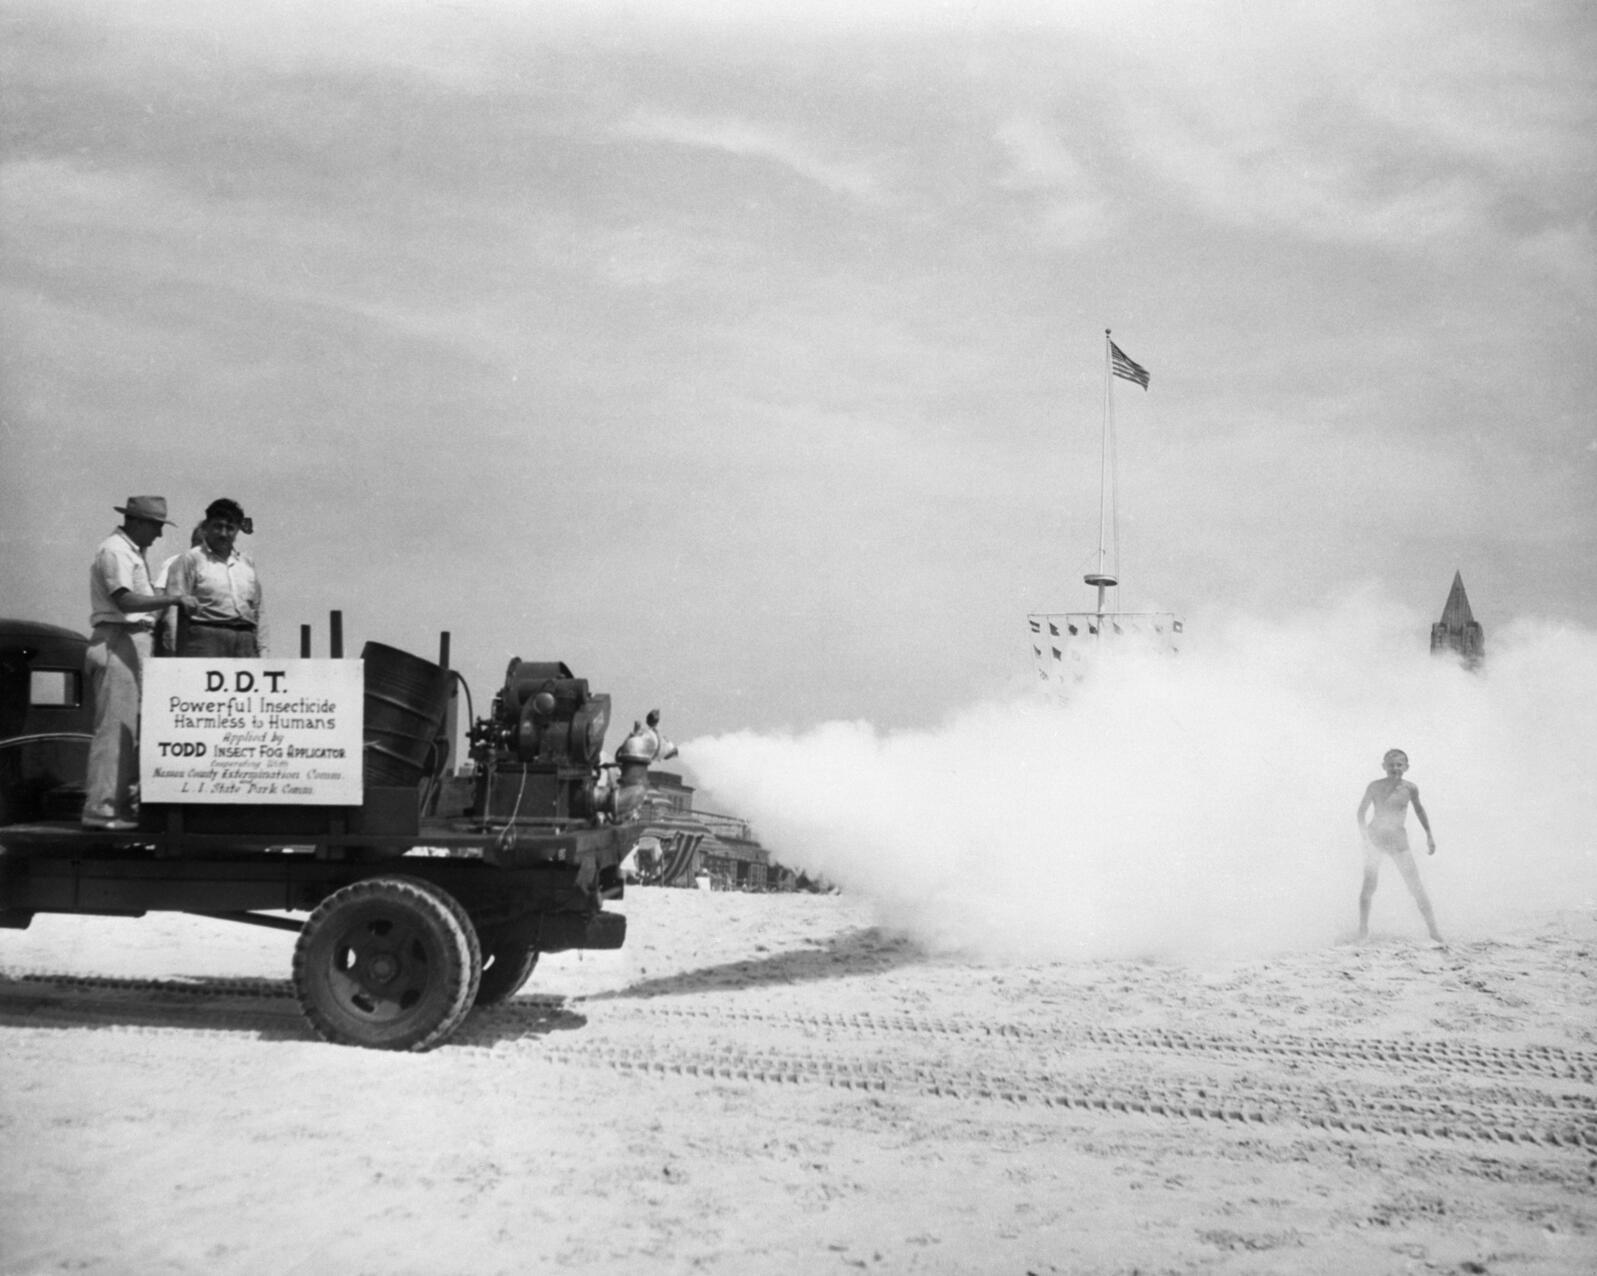 Mosquito control, Jones Beach State Park, Long Island, 1945 Bettmann/Corbis